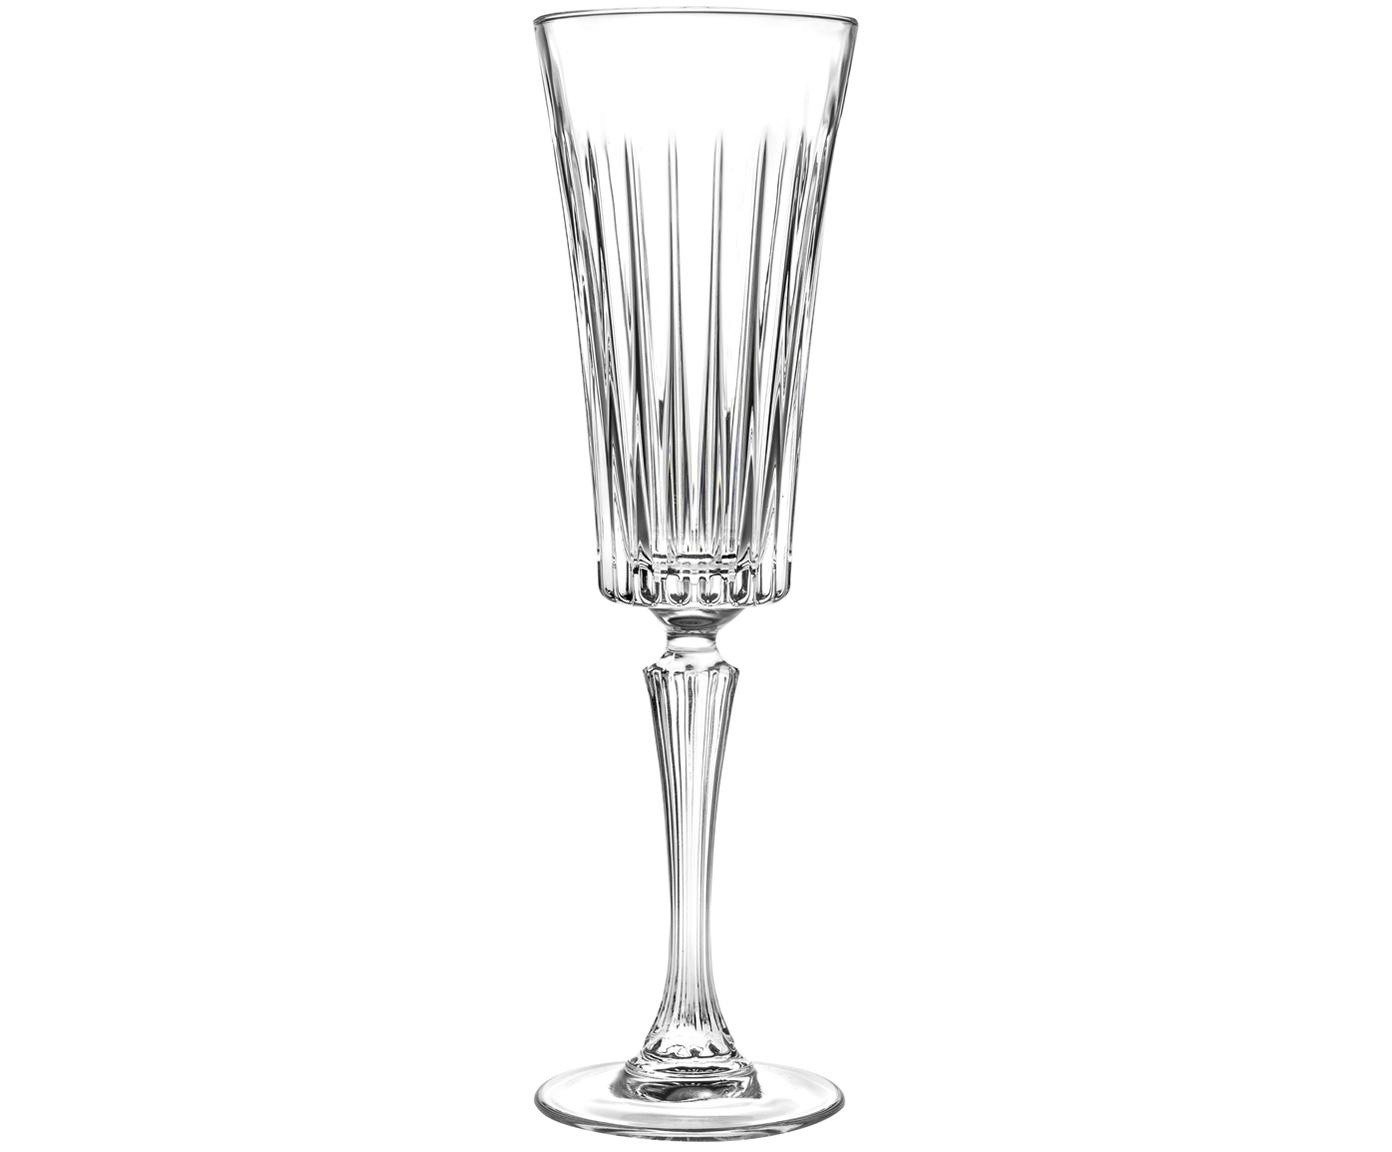 Kristallen champagneglazen Timeless, 6 stuks, Kristalglas, Transparant, Ø 8 x H 24 cm